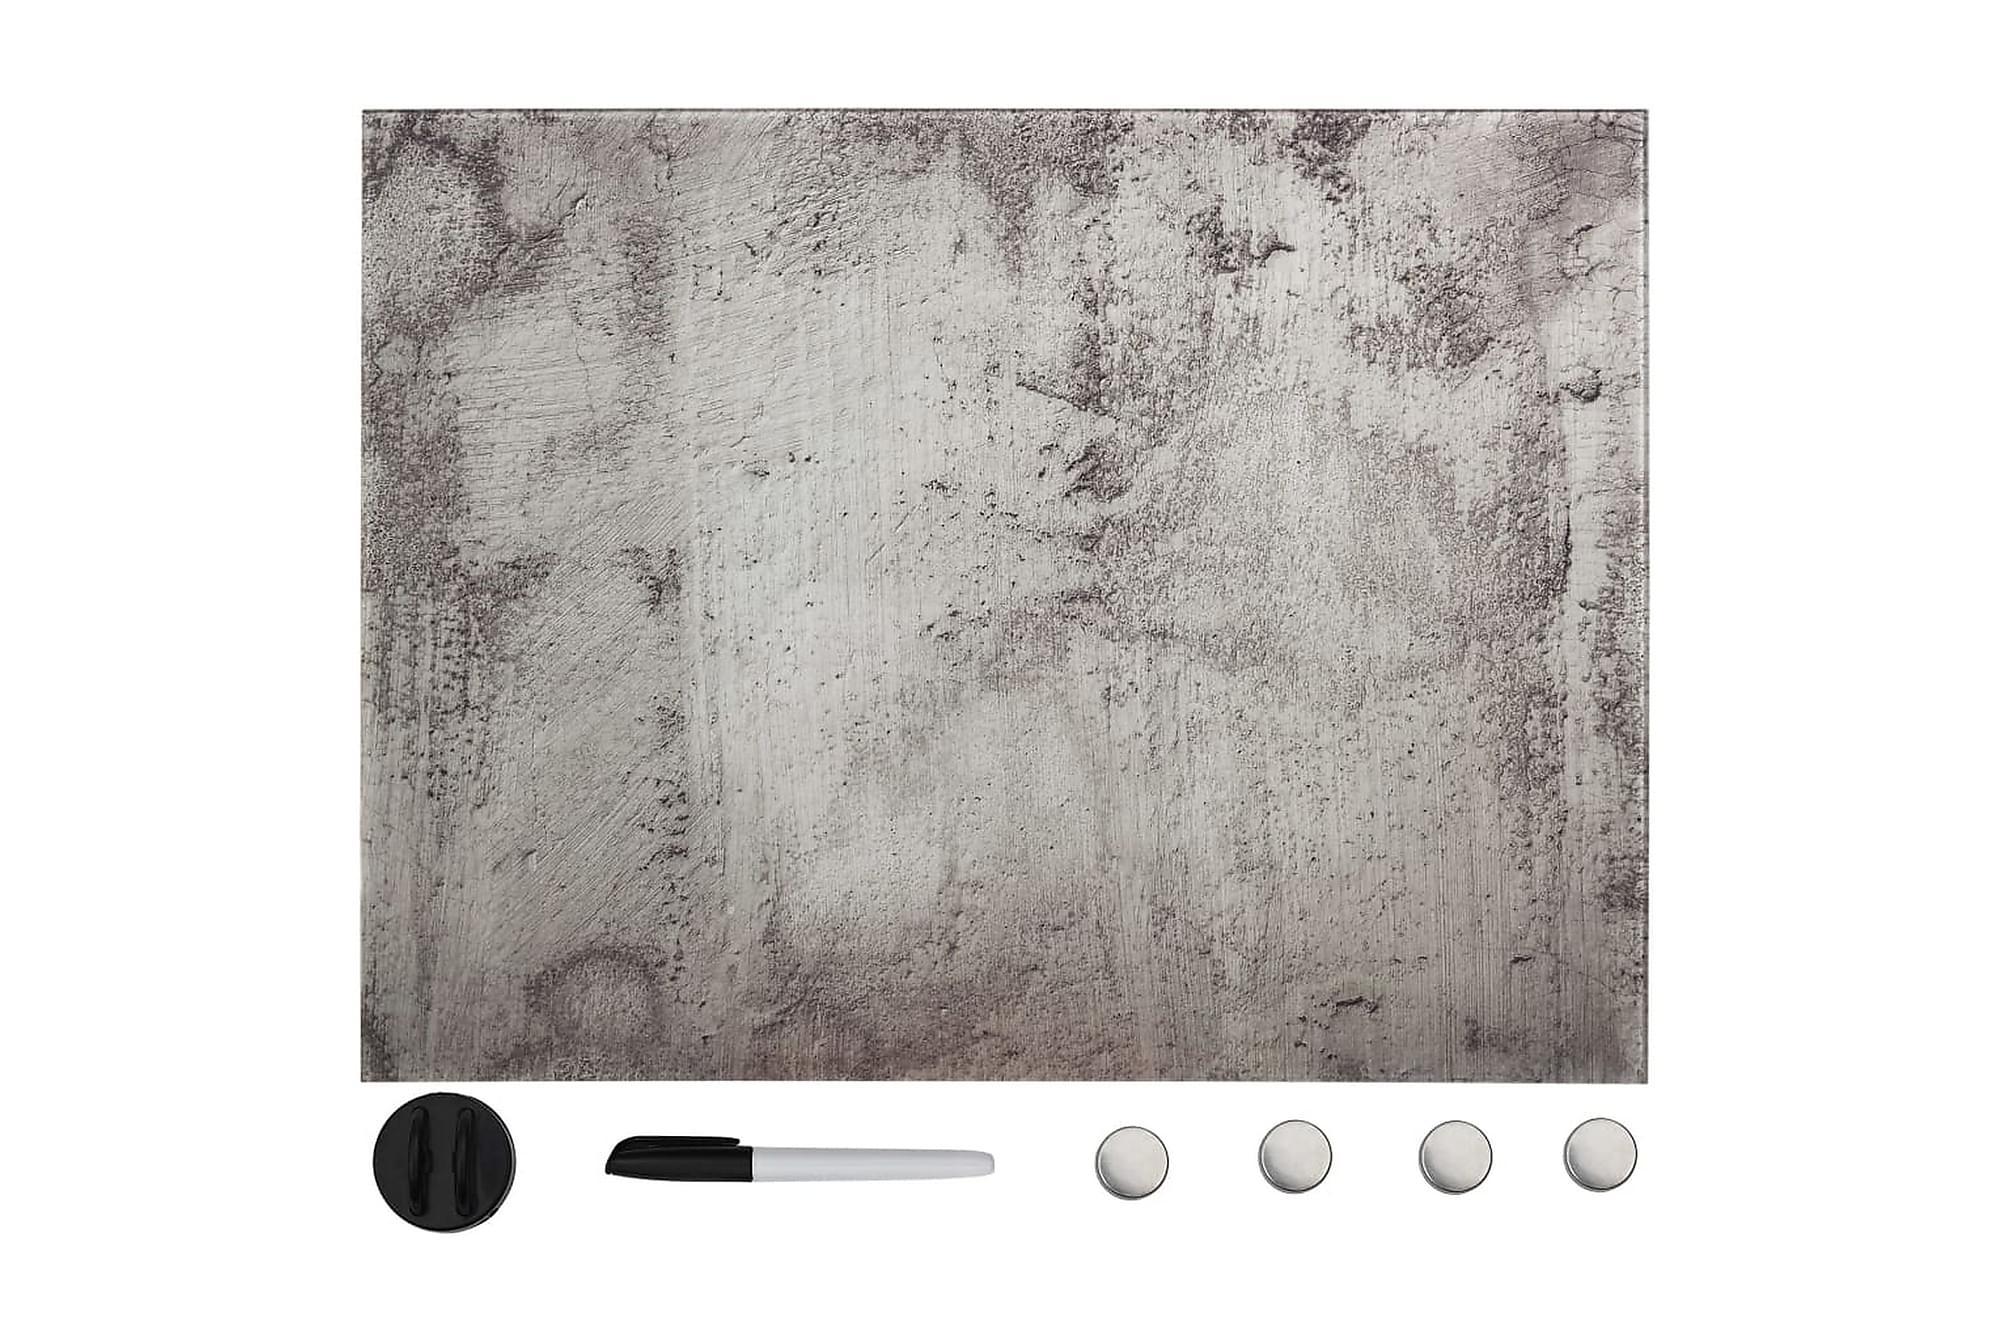 Magnetisk glastavla väggmonterad 80x60 cm, Whiteboards & griffeltavlor